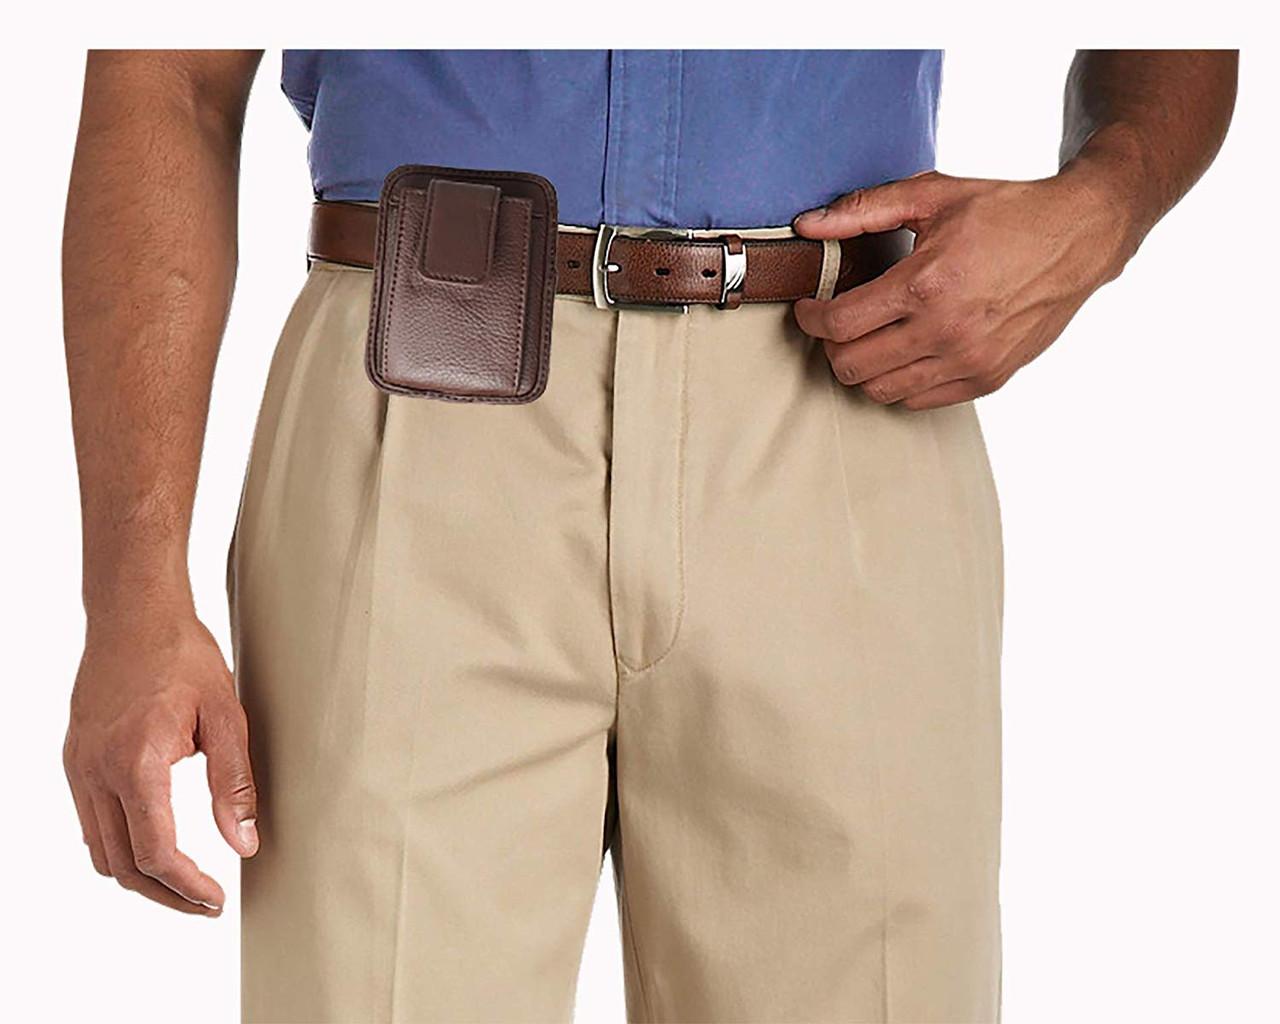 Premium Leather Unisex OWB CCW Flip Phone Belt Pack For Small Pistols